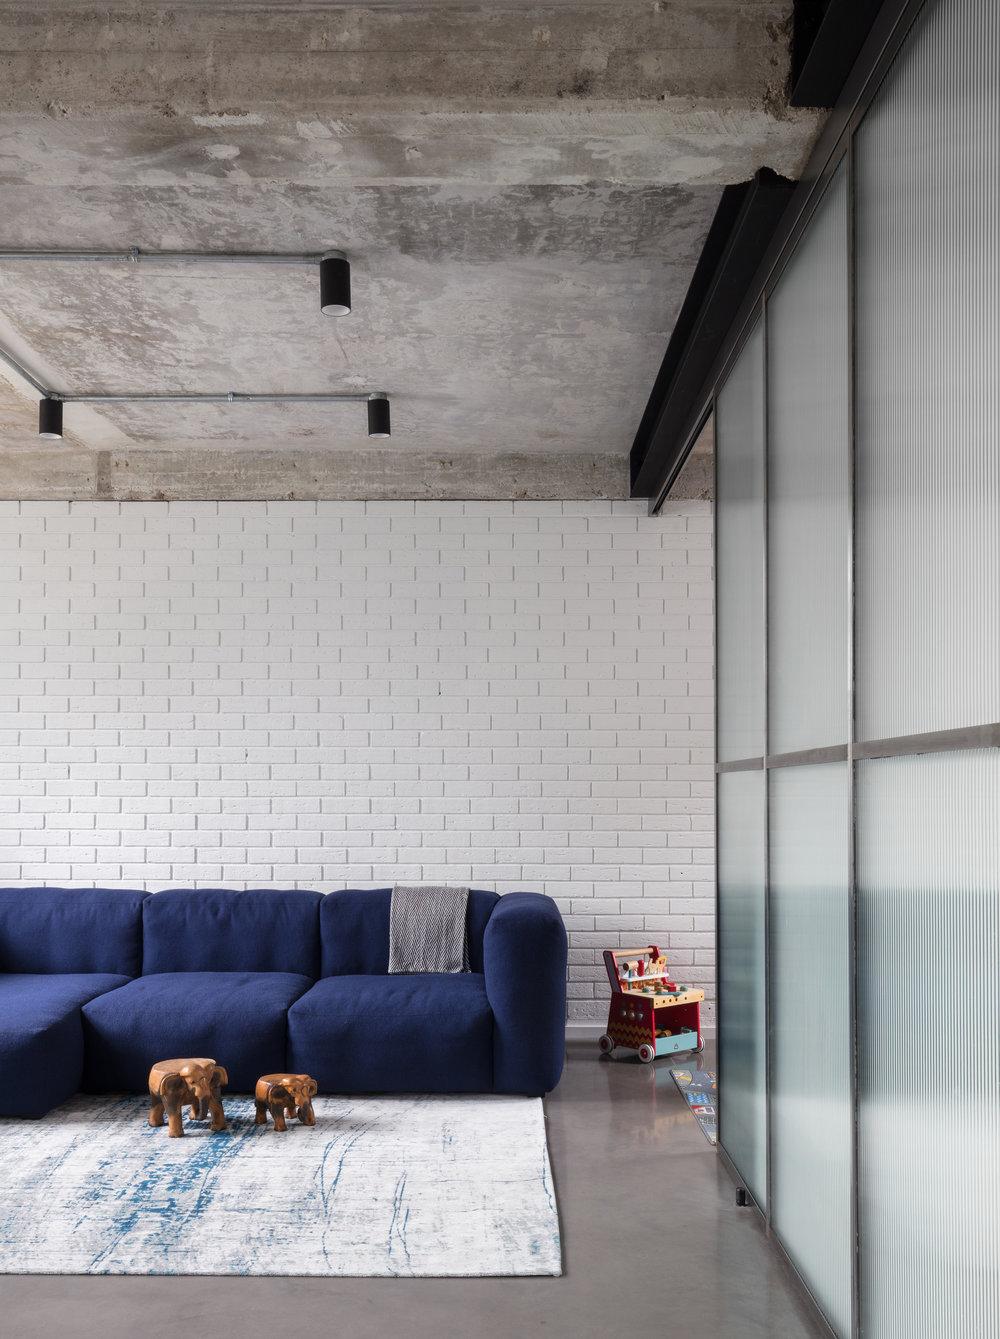 Union-Wharf-Islington-London-Exposed-Concrete-Ceiling-Floor-Hay-Sofa-Interior-Architect.jpg